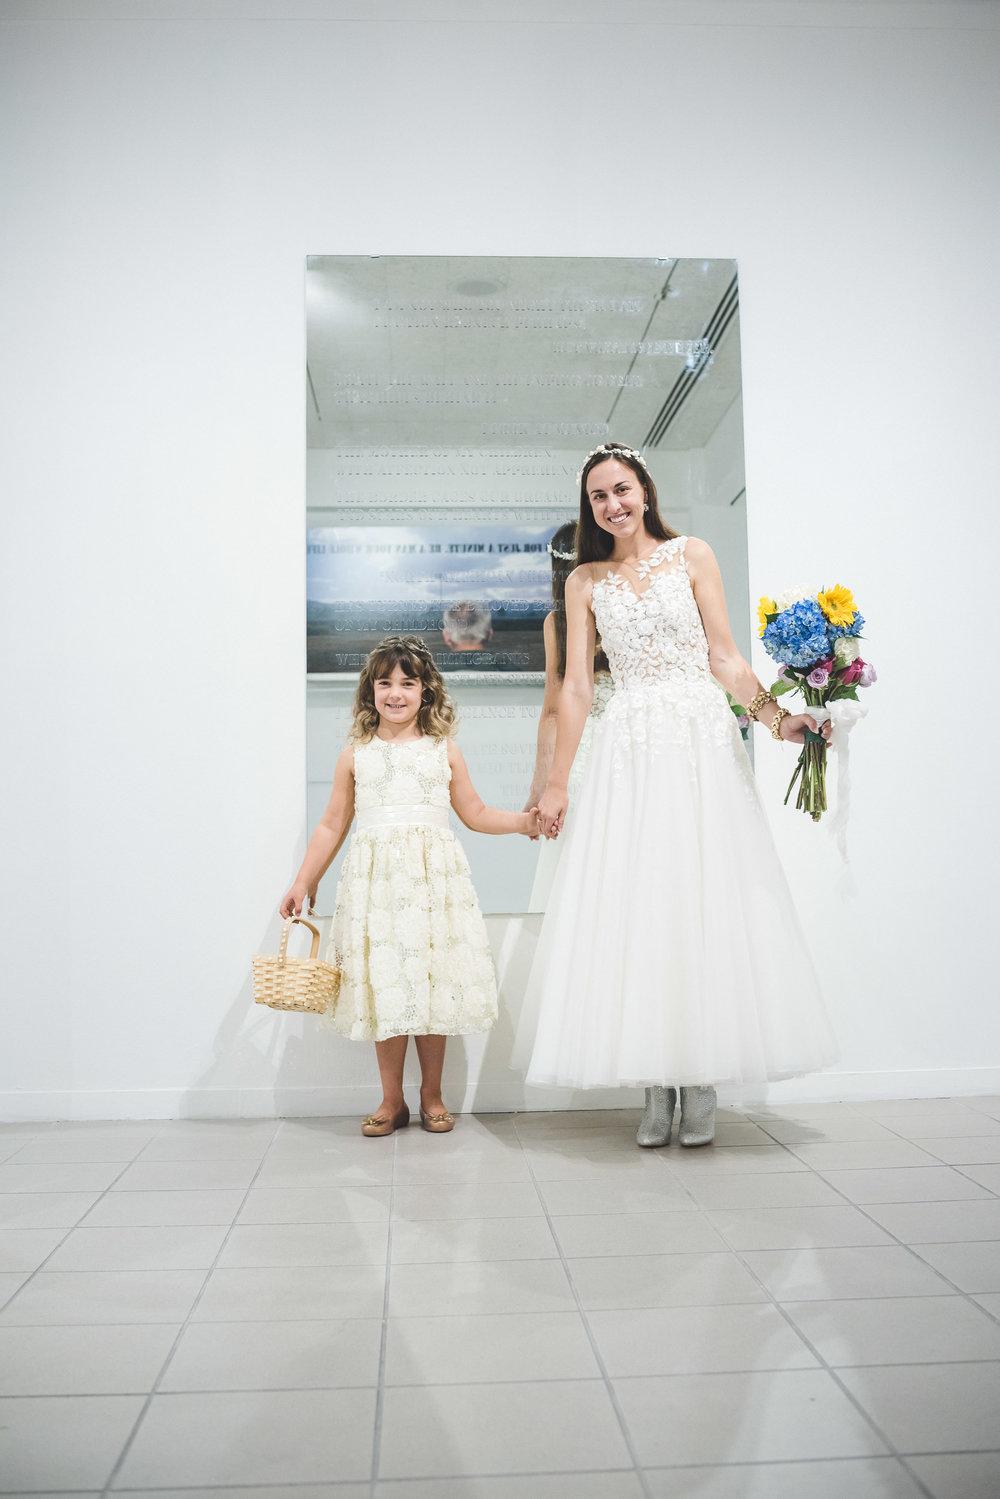 sIndia + Ulrick - 04 Bridal Party Portraits-24.jpg